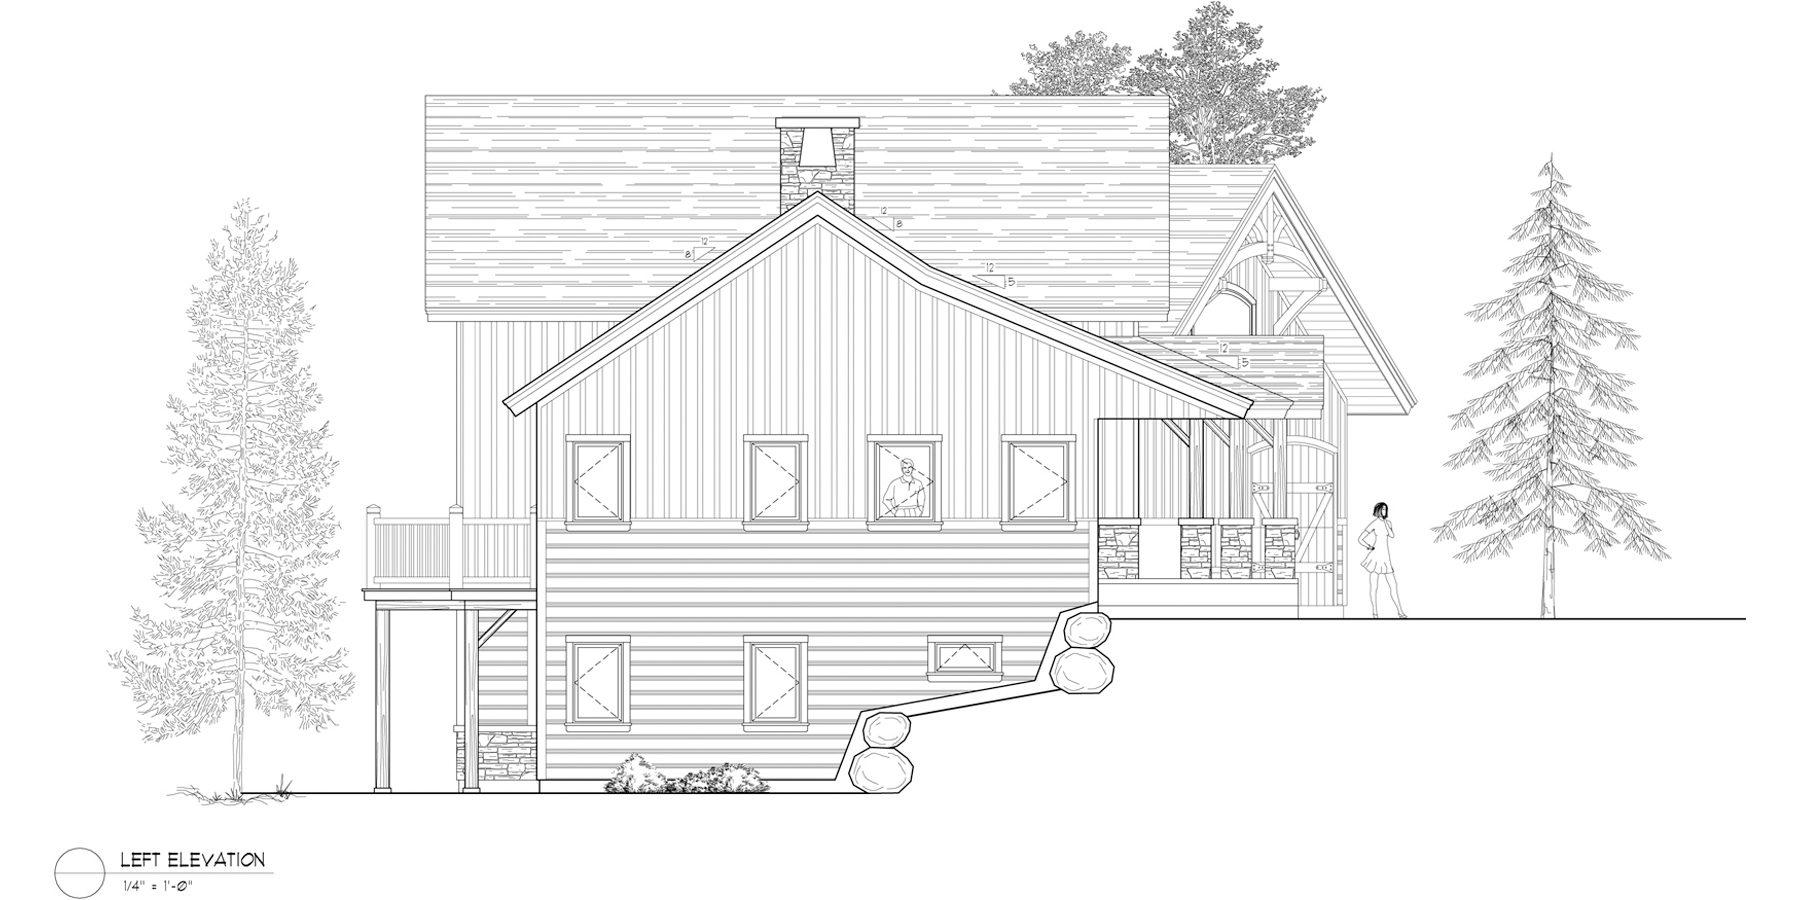 Normerica Timber Frames, House Plan, Algoma 3538, Left Elevation